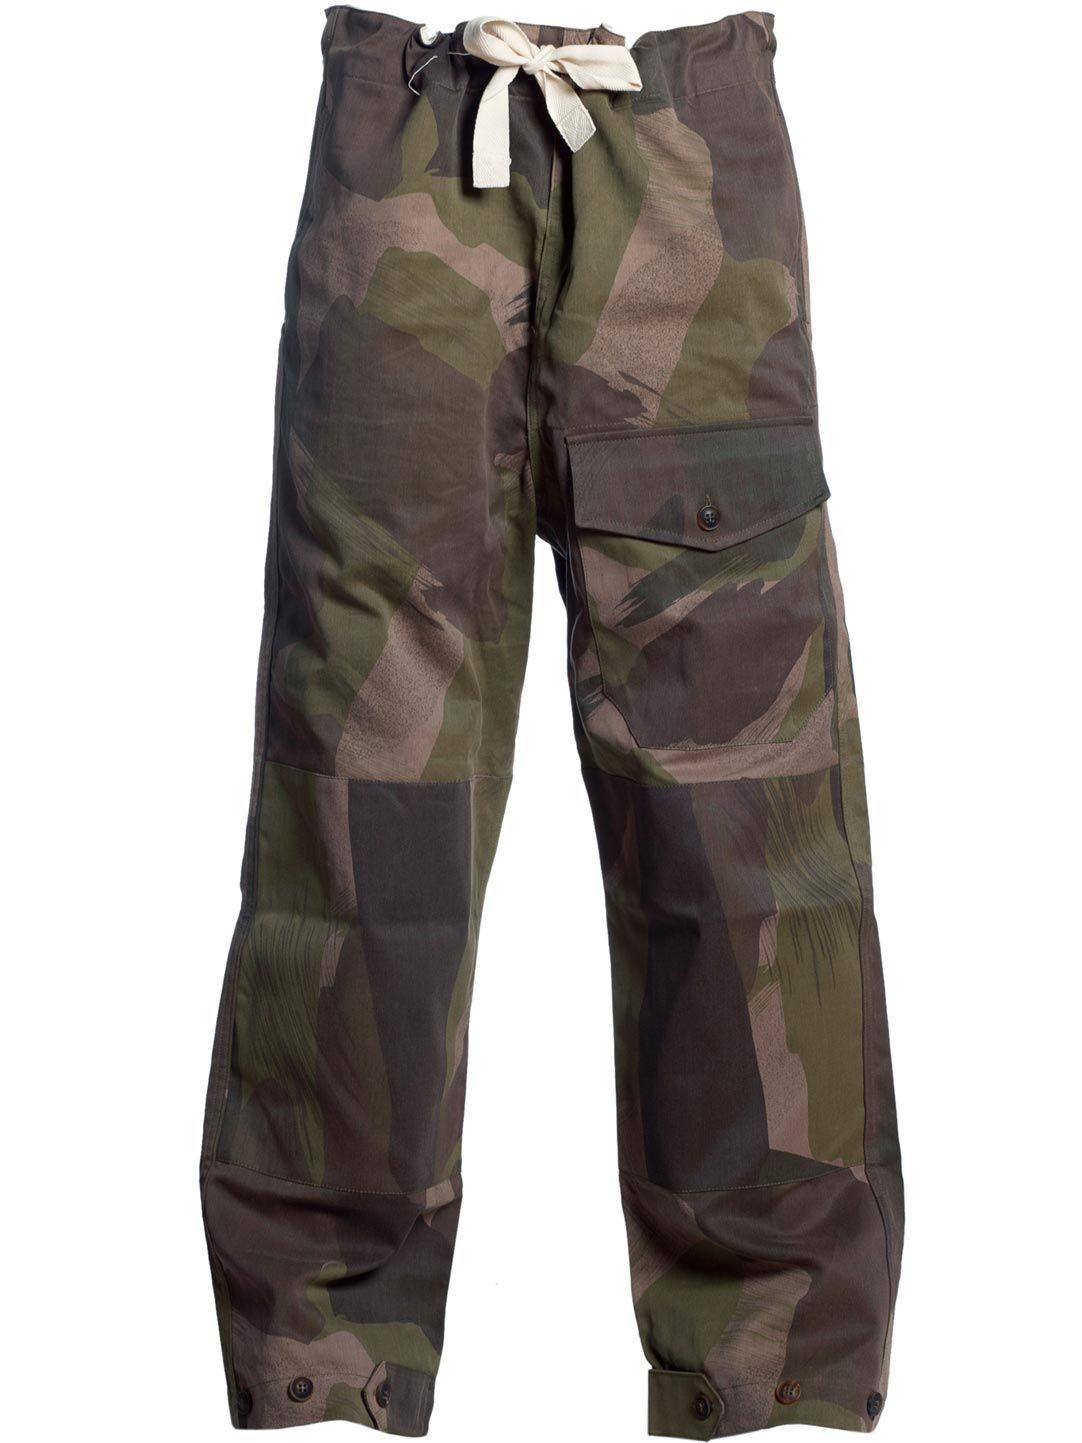 8781de5deb62 Nigel Cabourn Men s Army Drill Work Trousers